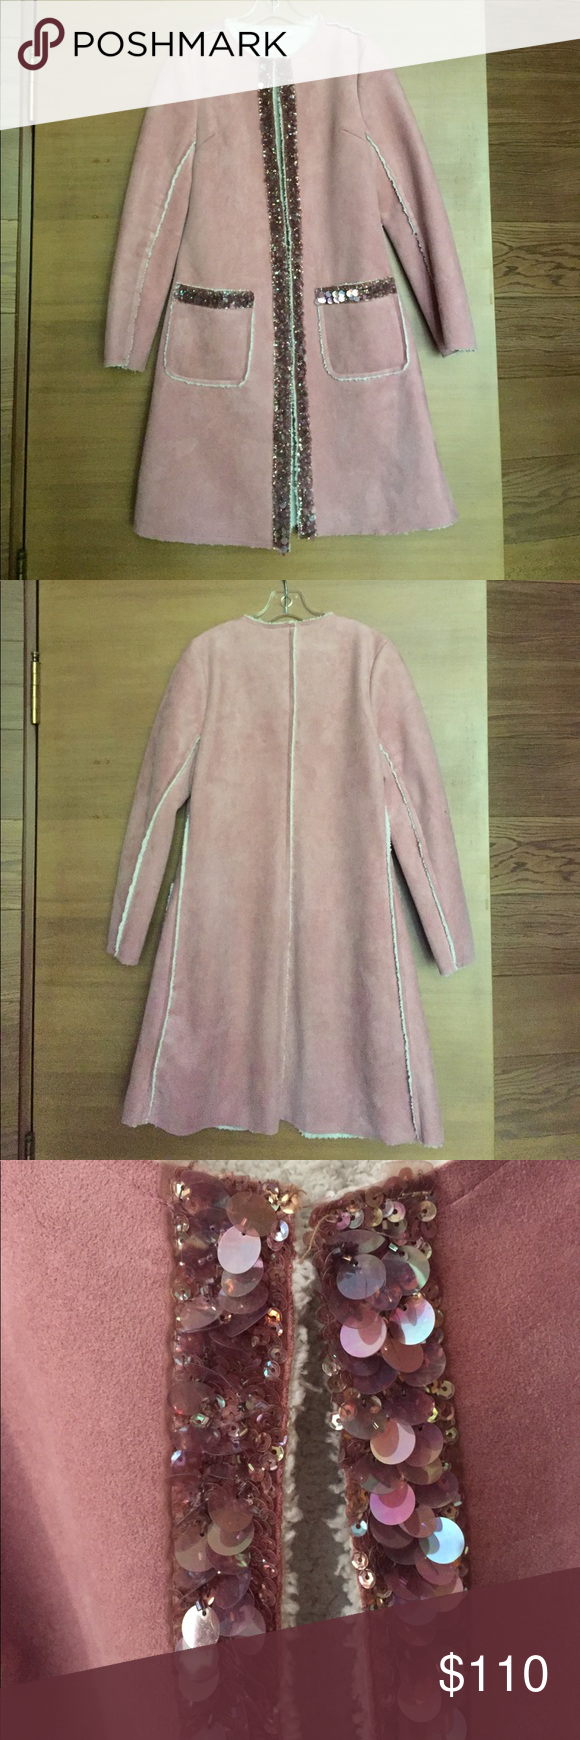 MONKEY WEAR faux shearling coat | Faux shearling coat, Shearling ...